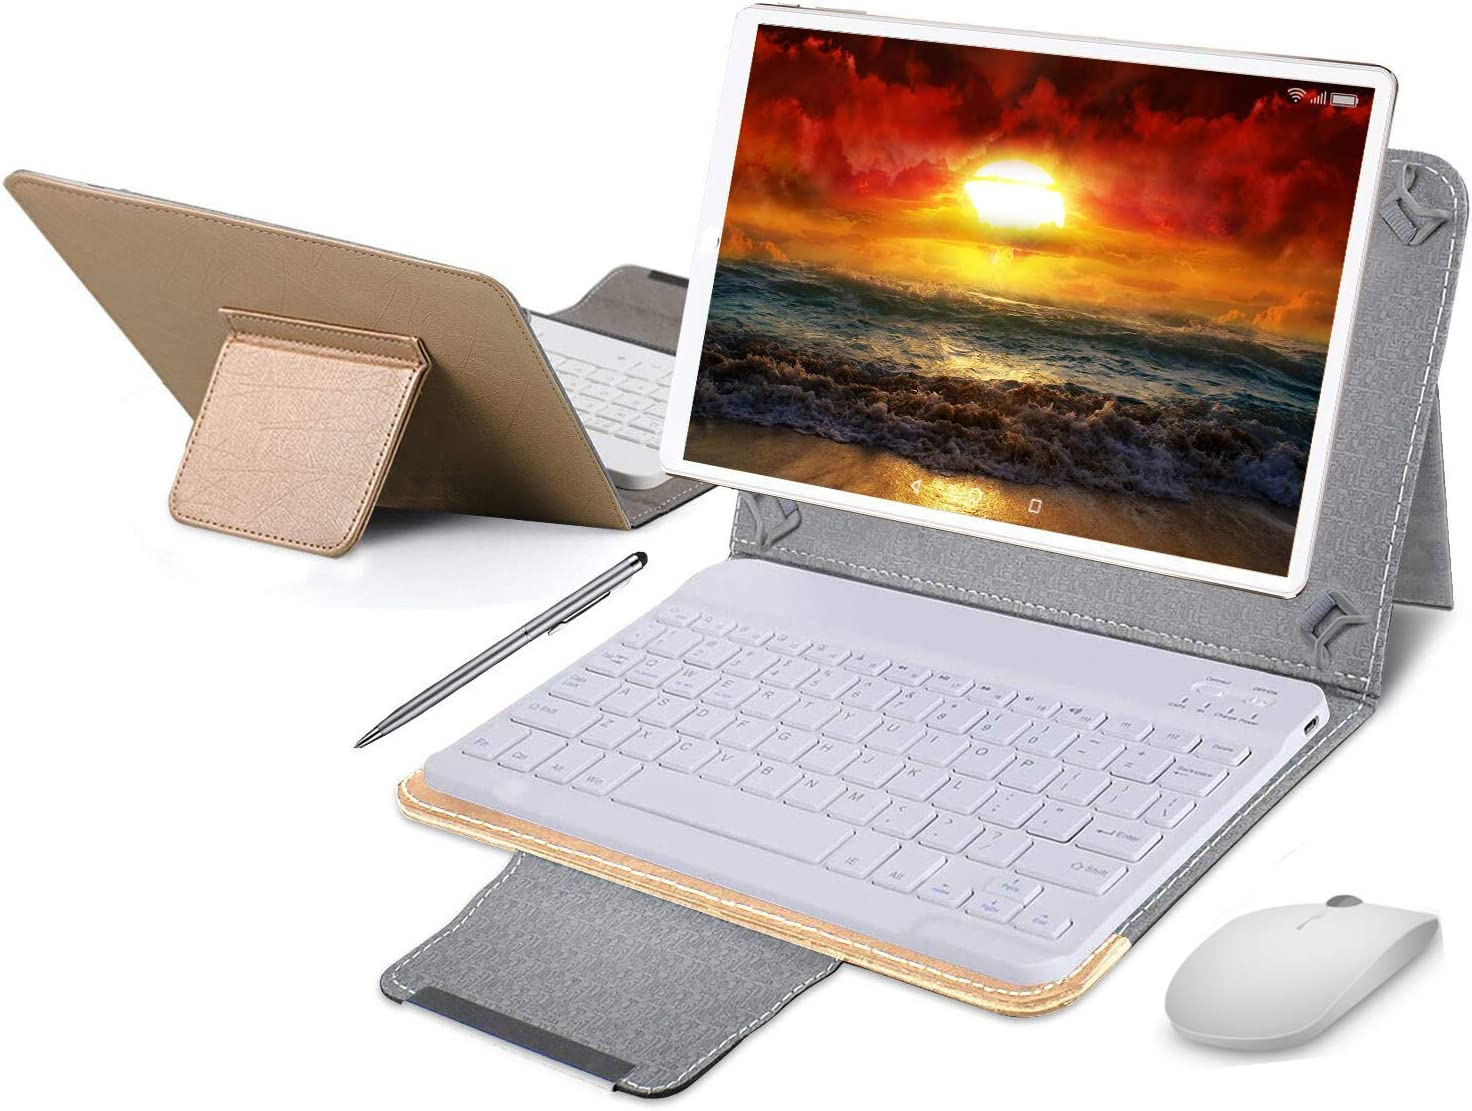 Tablet 10 Pulgadas 4G Full HD 4GB de RAM 64GB de ROM Android 9.0 Certificado por Google GMS Tablet PC Batería 8500mAh Quad Core Dual SIM 8MP Cámara Google Netflix WiFi Bluetooth GPS OTG(Oro)